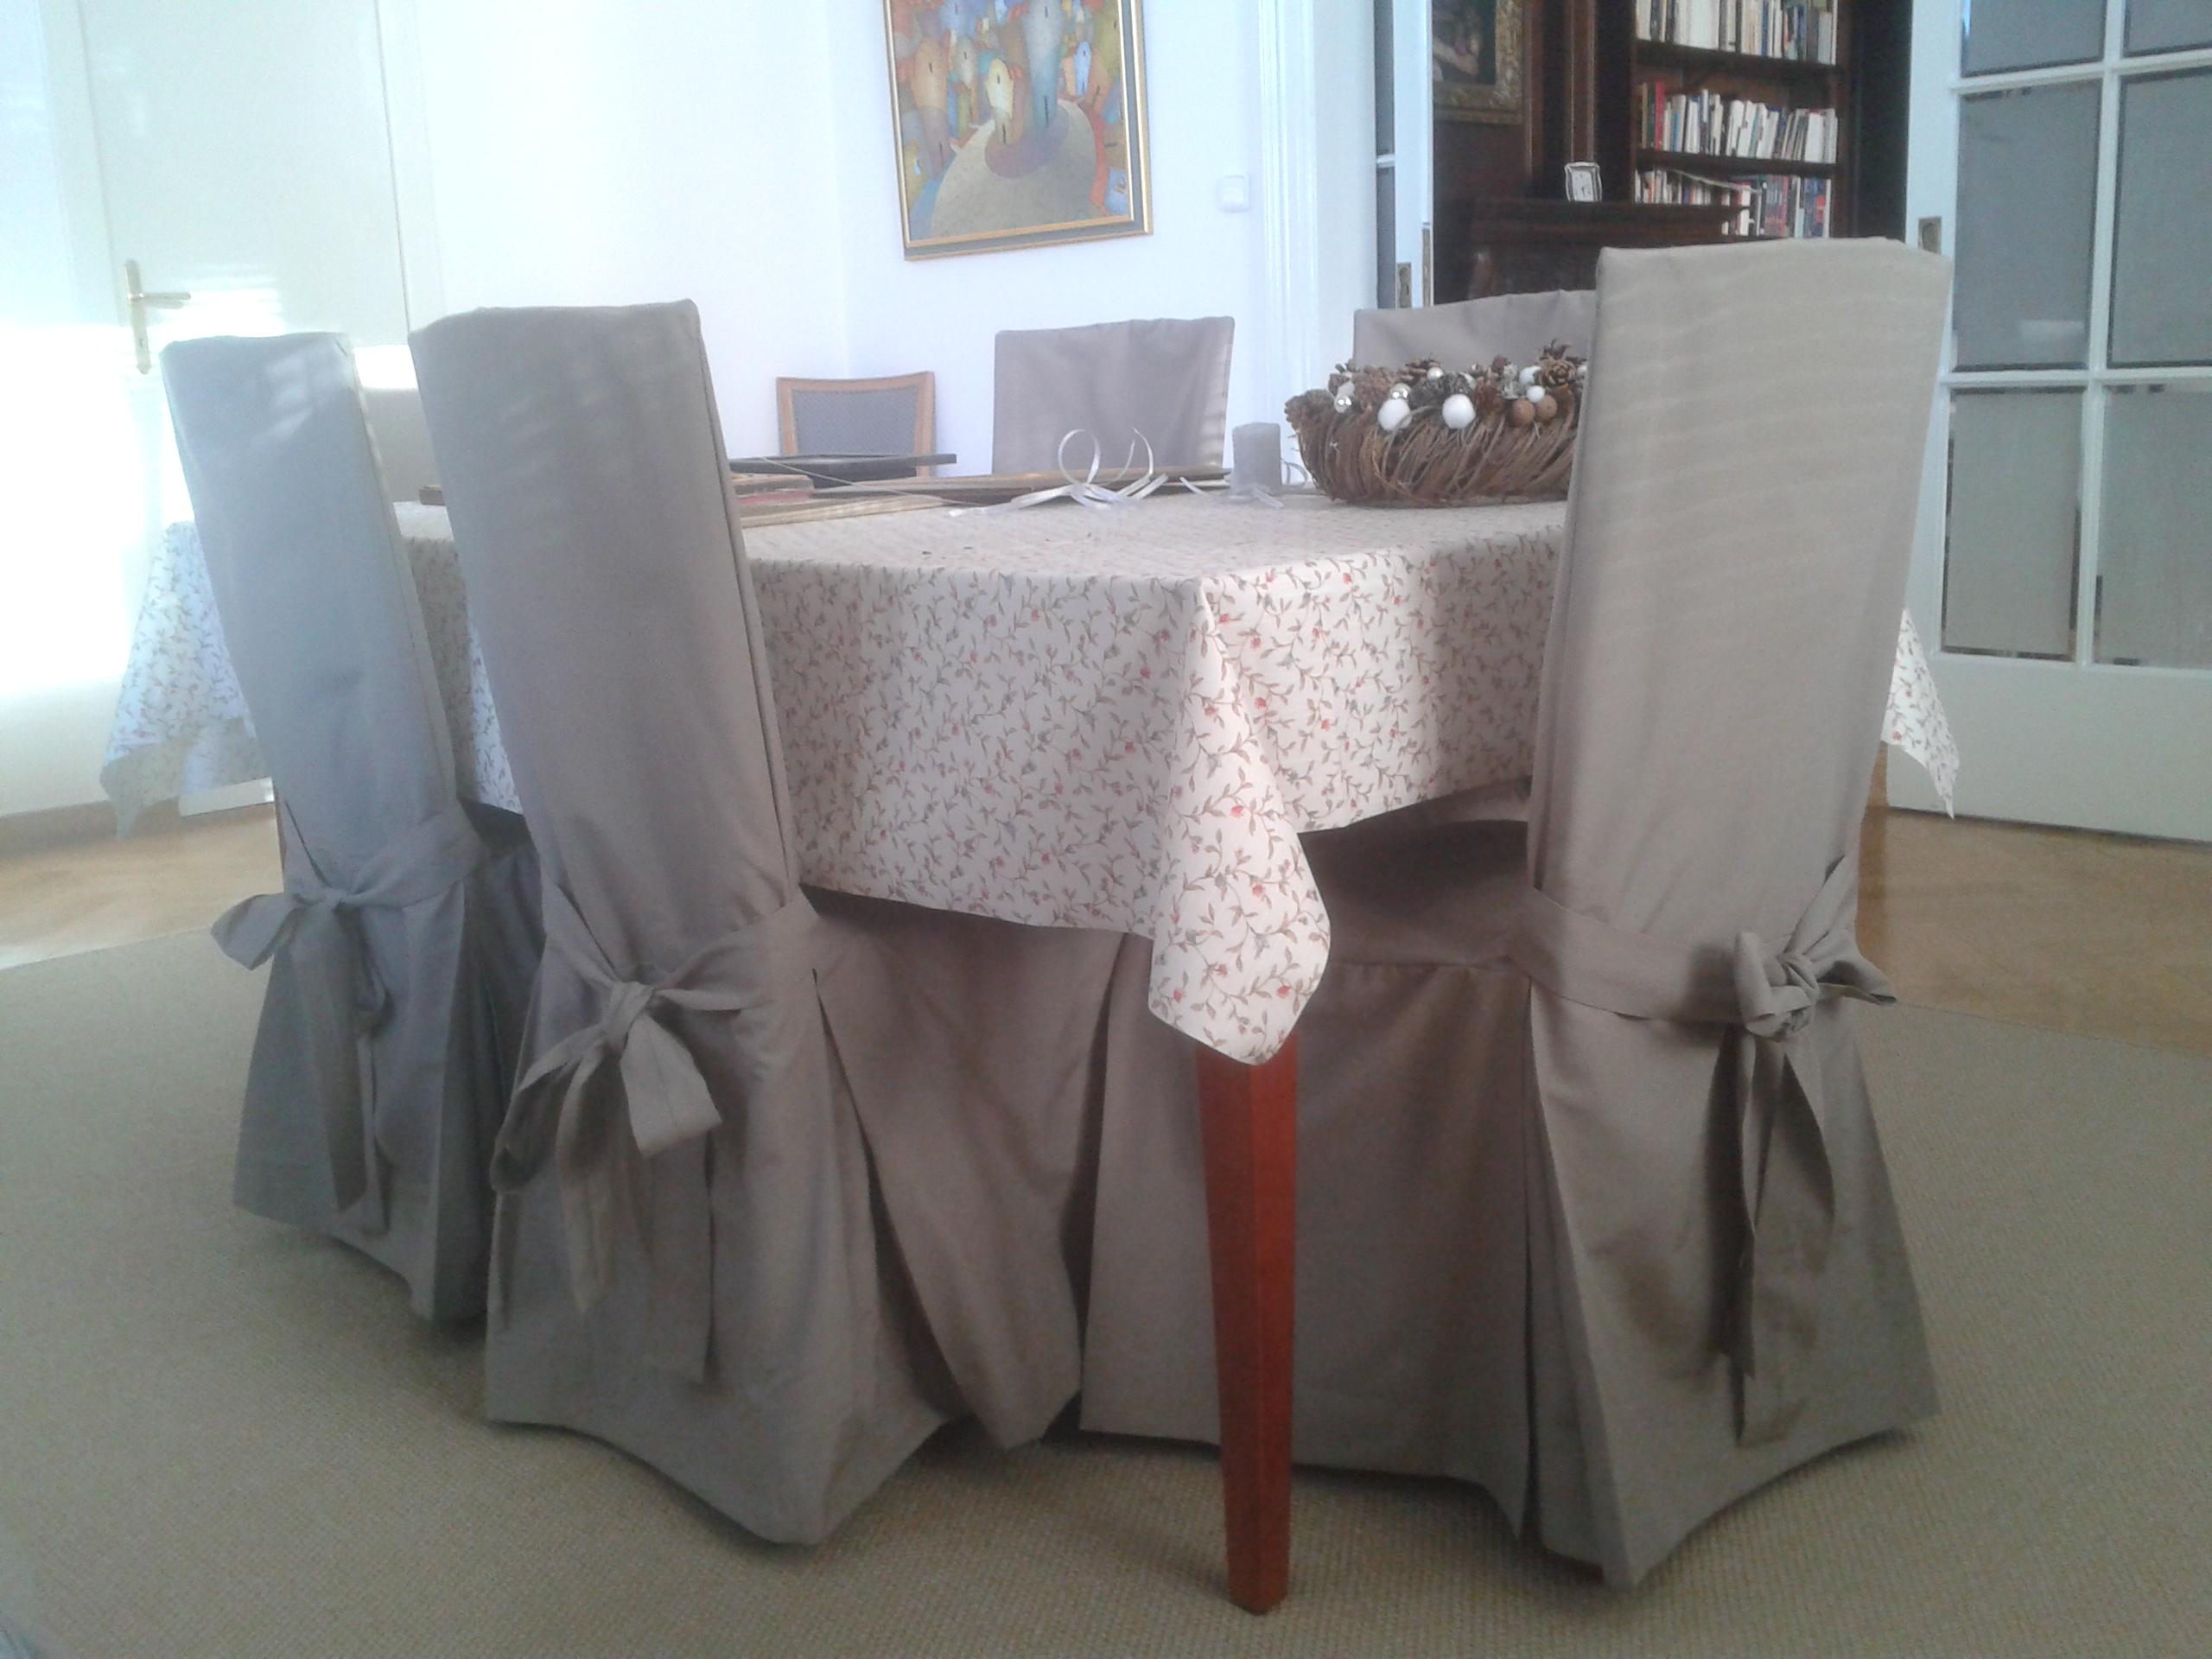 Přehozy - potahy Ikea židlí 7c448def0b3